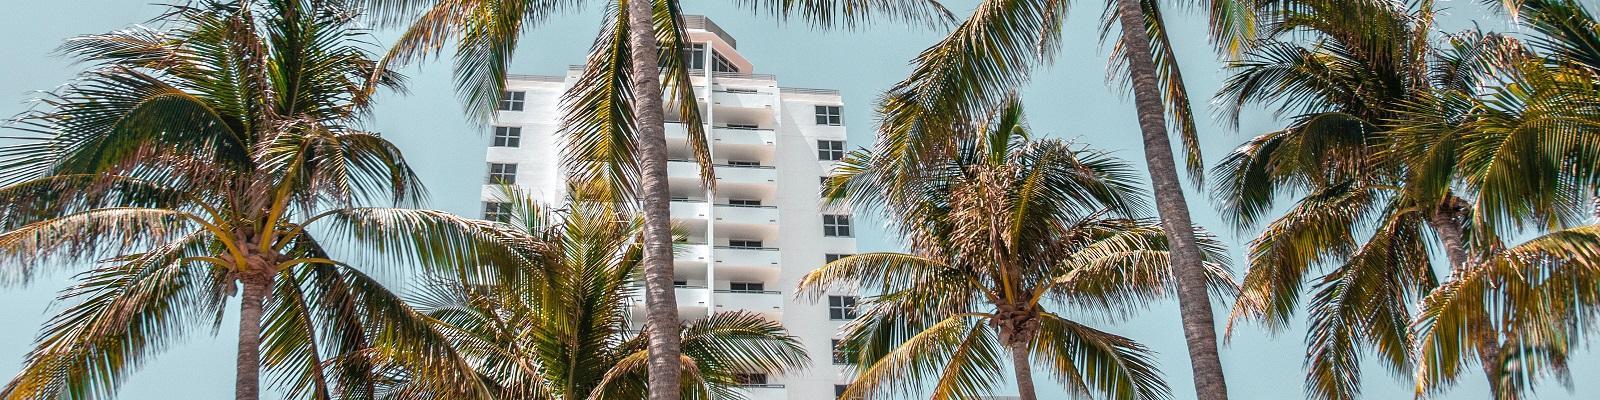 Palm trees in Miami Beach, Florida